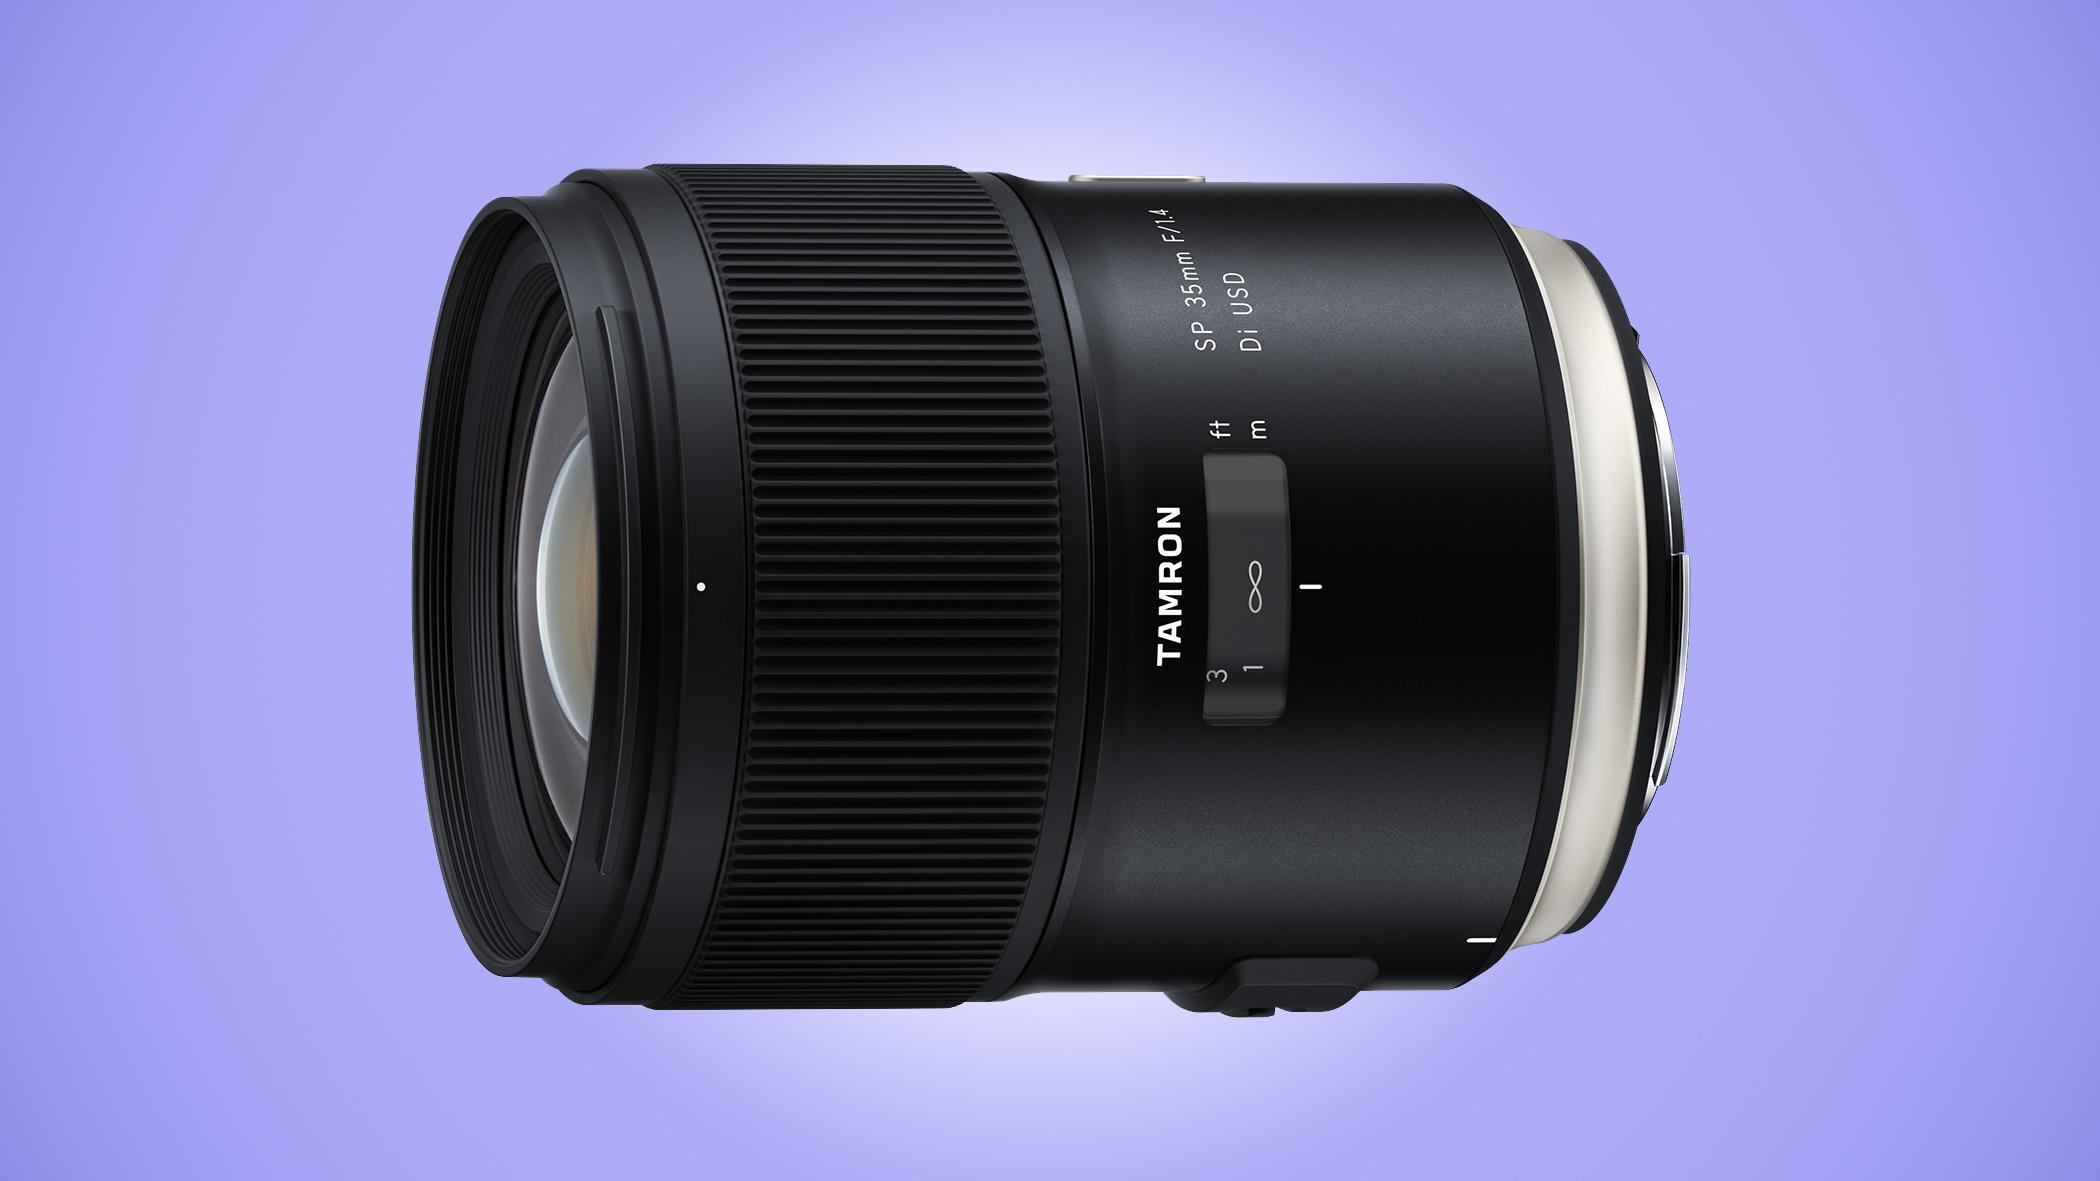 Tamron makes its SP 35mm f/1.4 Di USD official